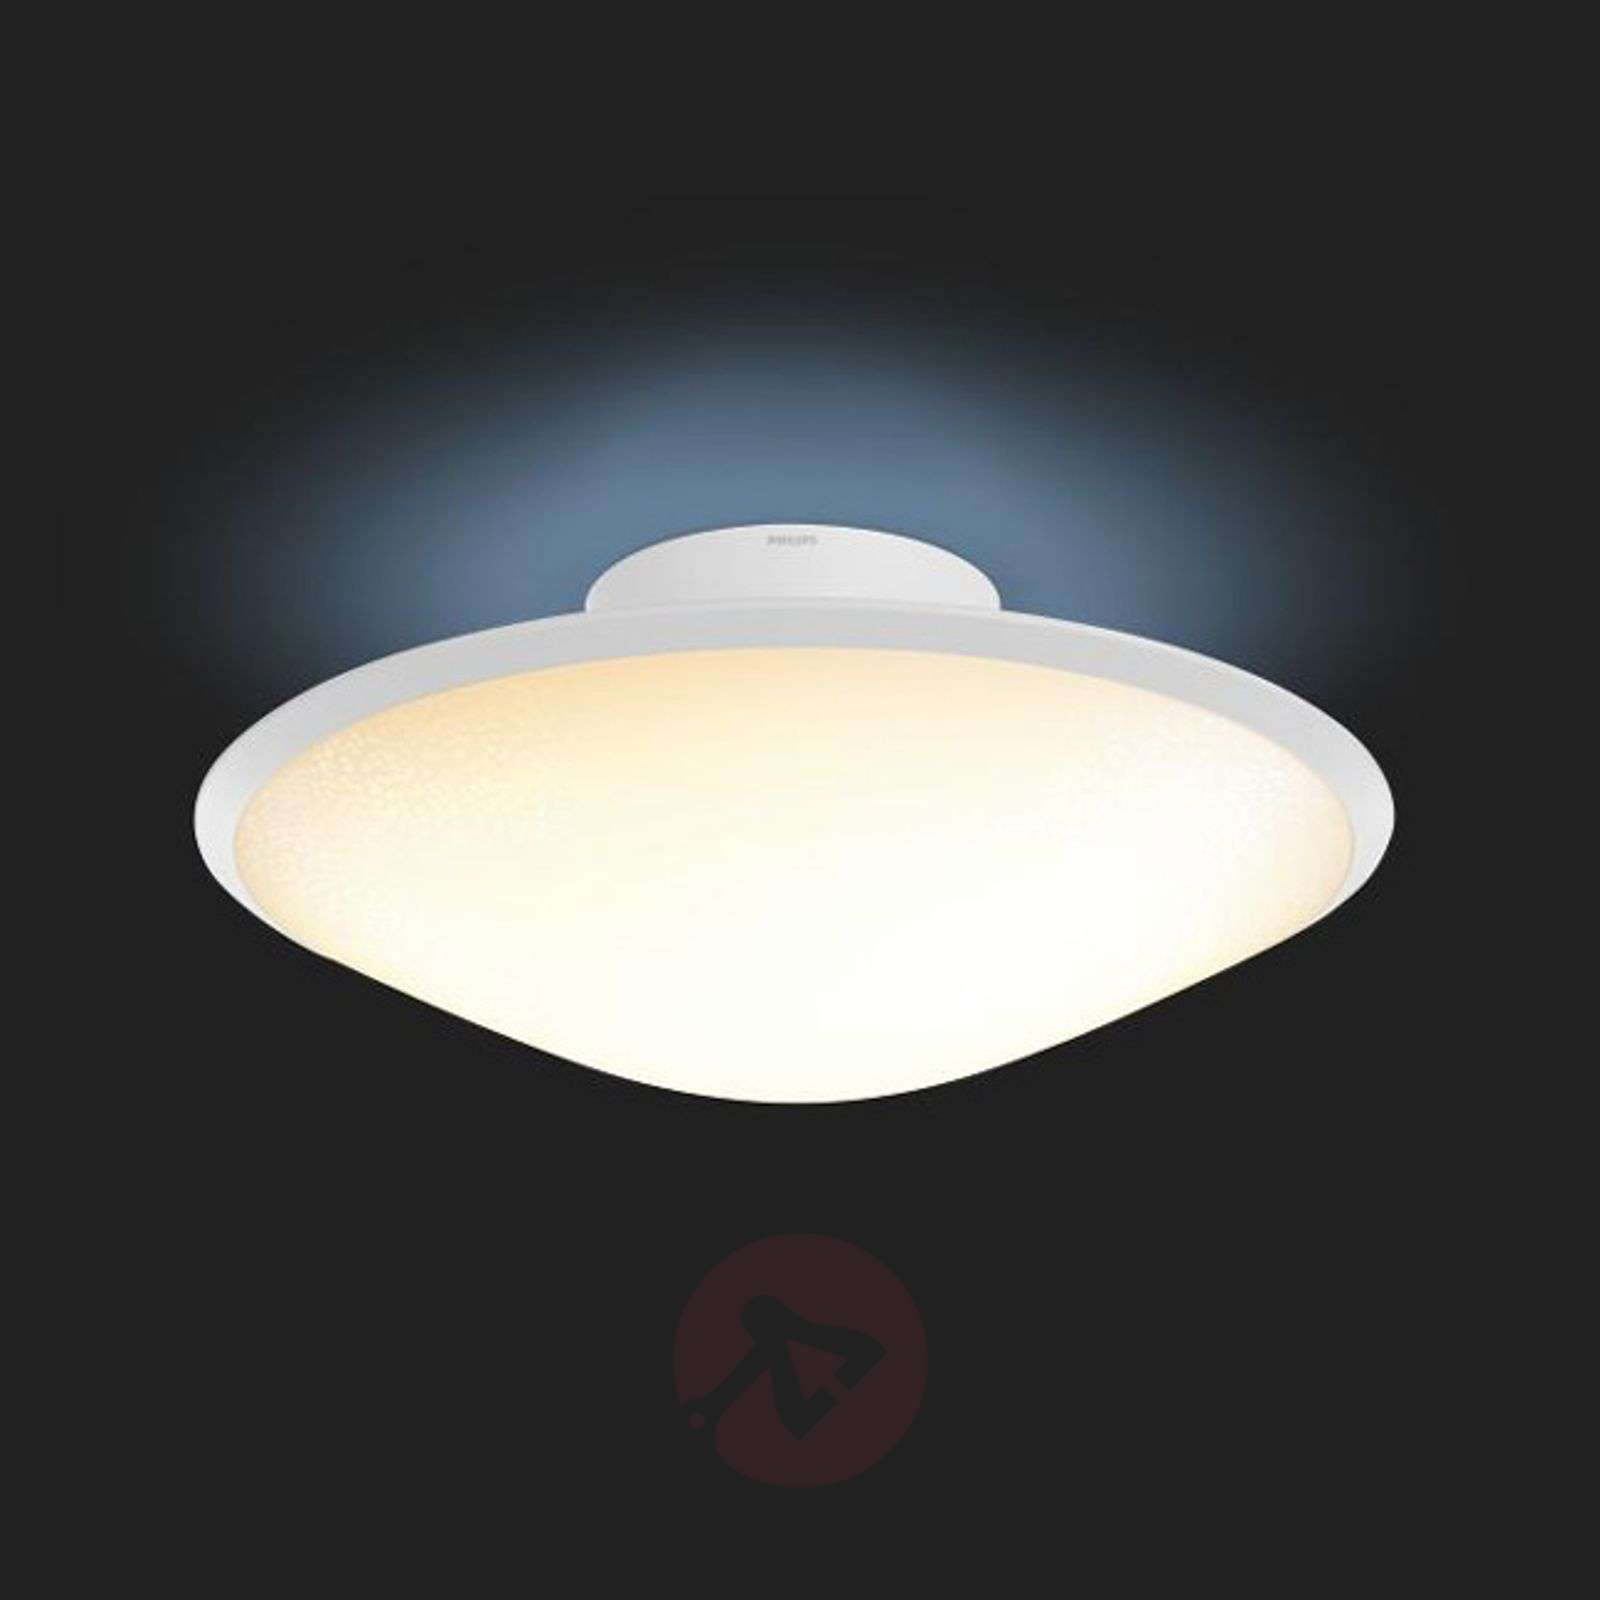 Kattovalaisin Philips Hue Phoenix, White Ambiance-7531608-01